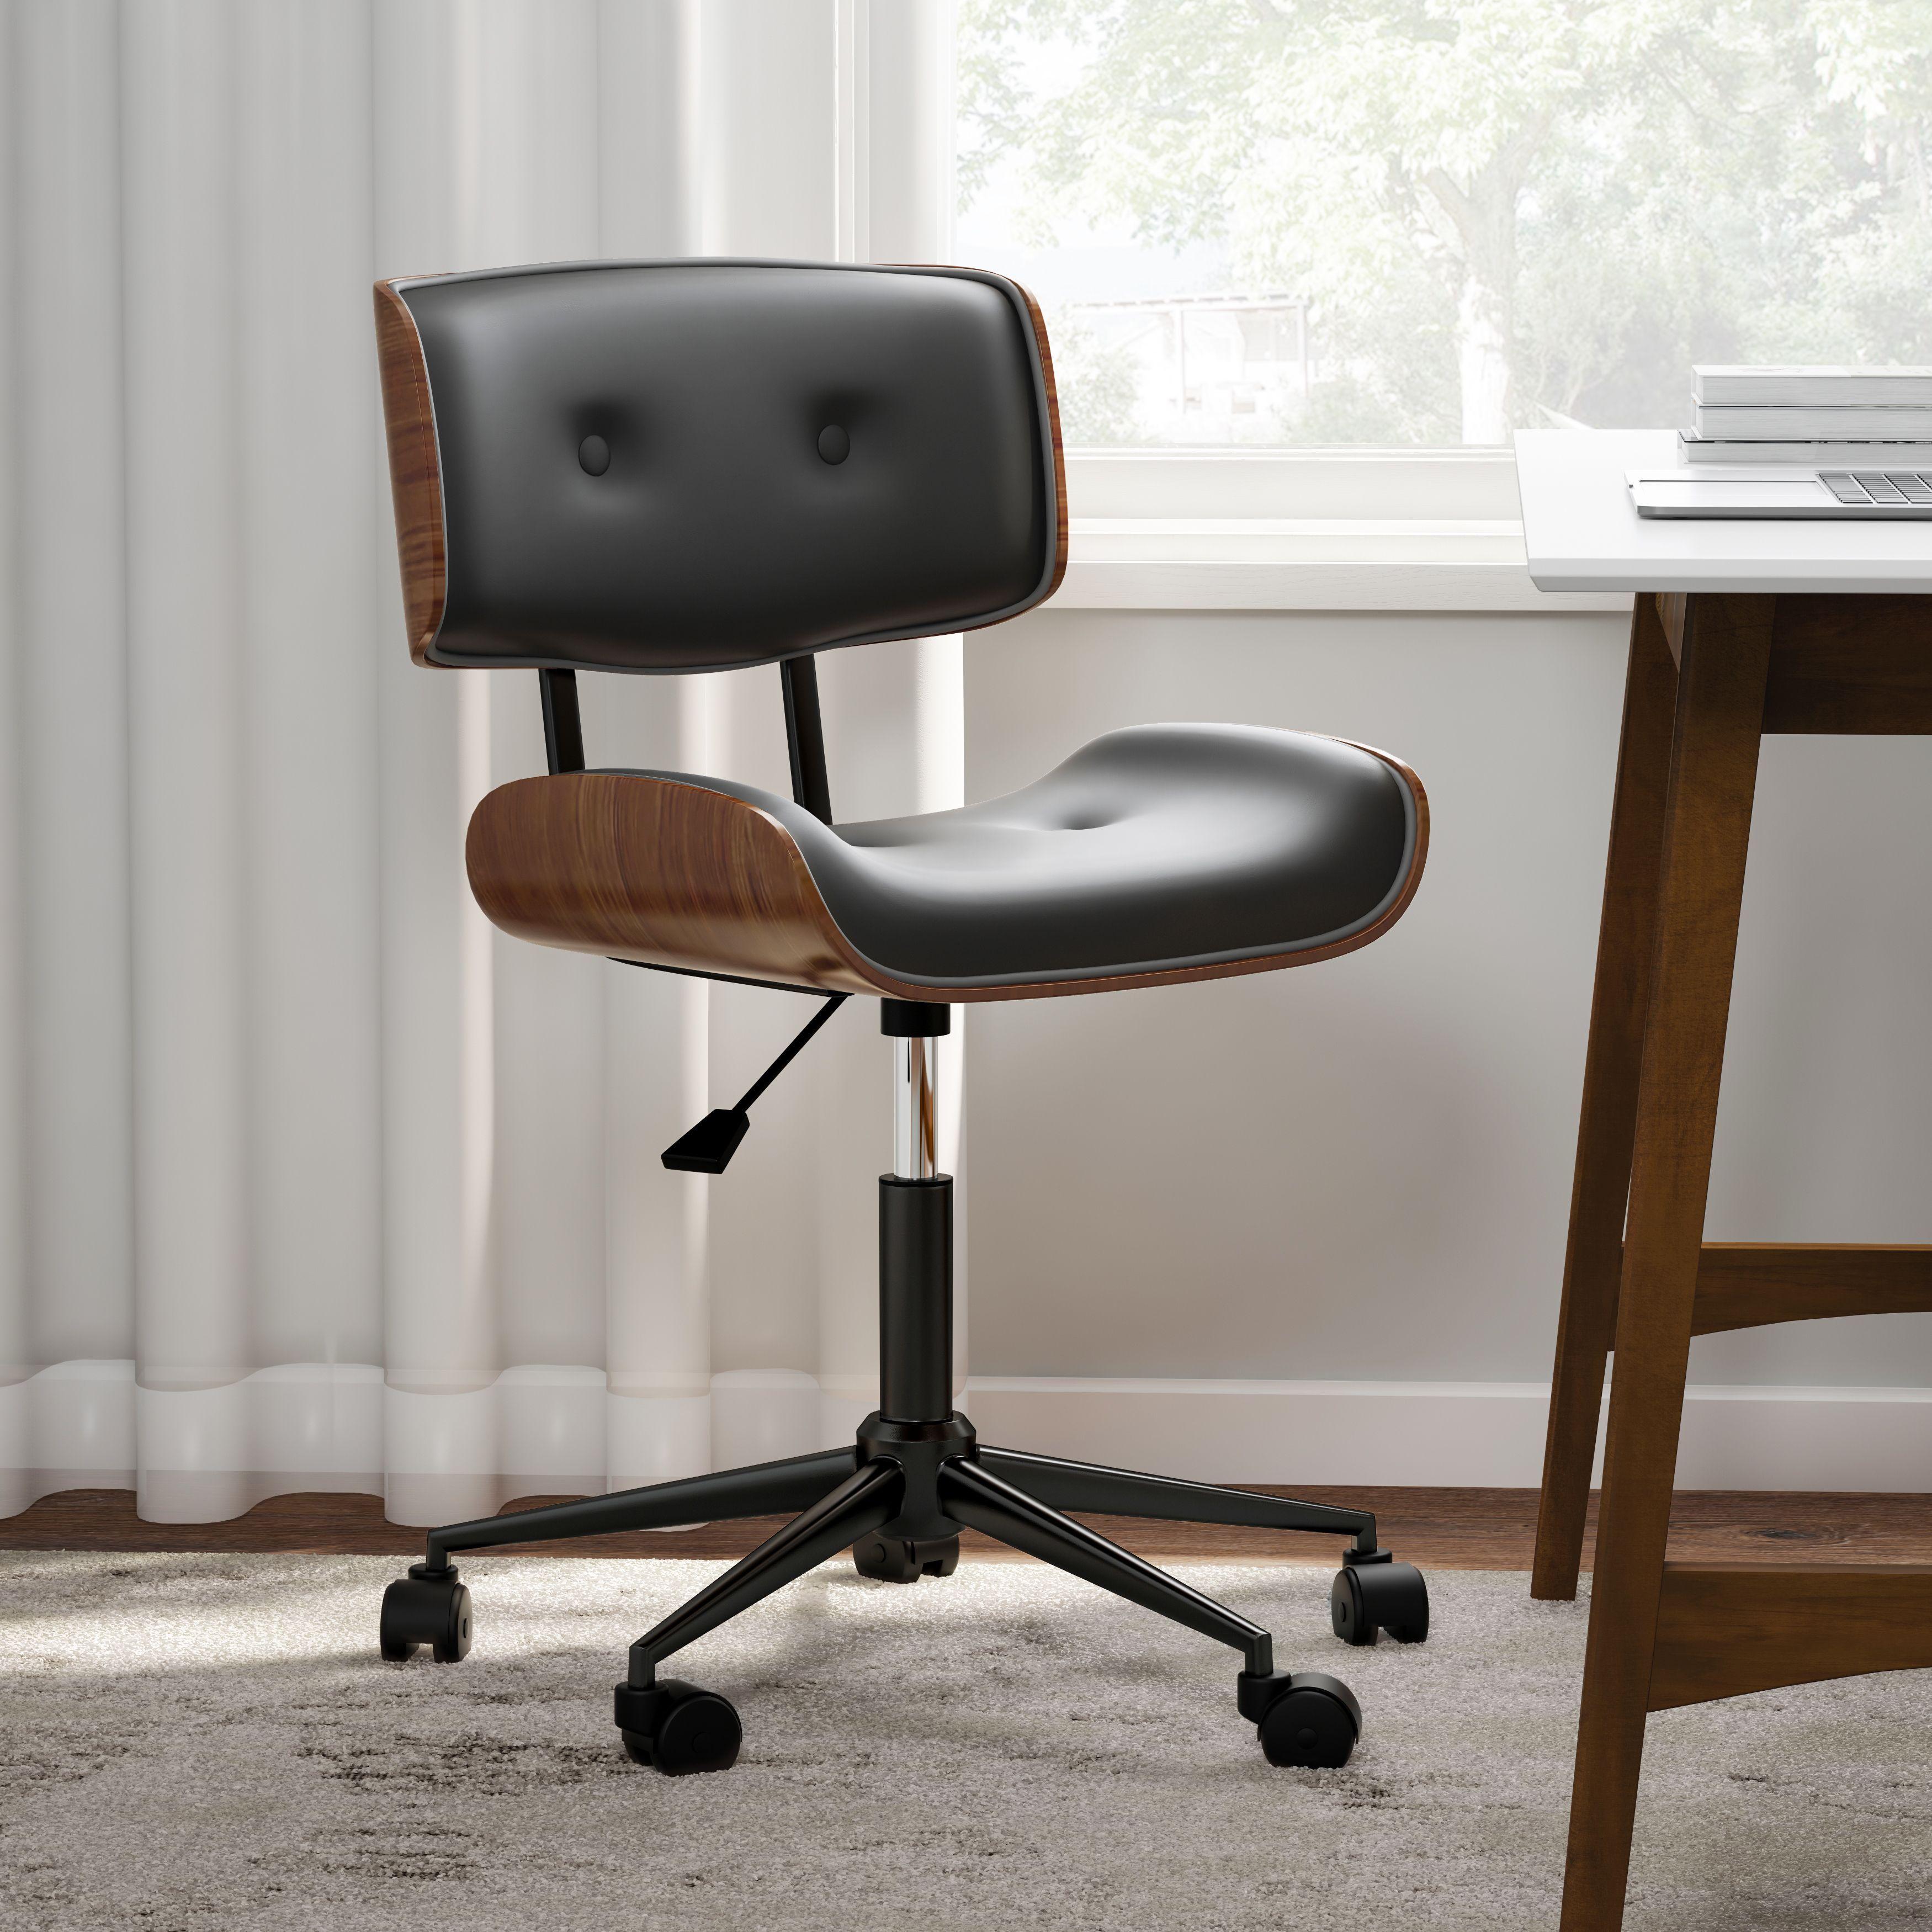 Carson Carrington Leksand Simple Mid Century Modern Office Chair Modern Office Chair Mid Century Modern Office Chair Mid Century Modern Desk Chair